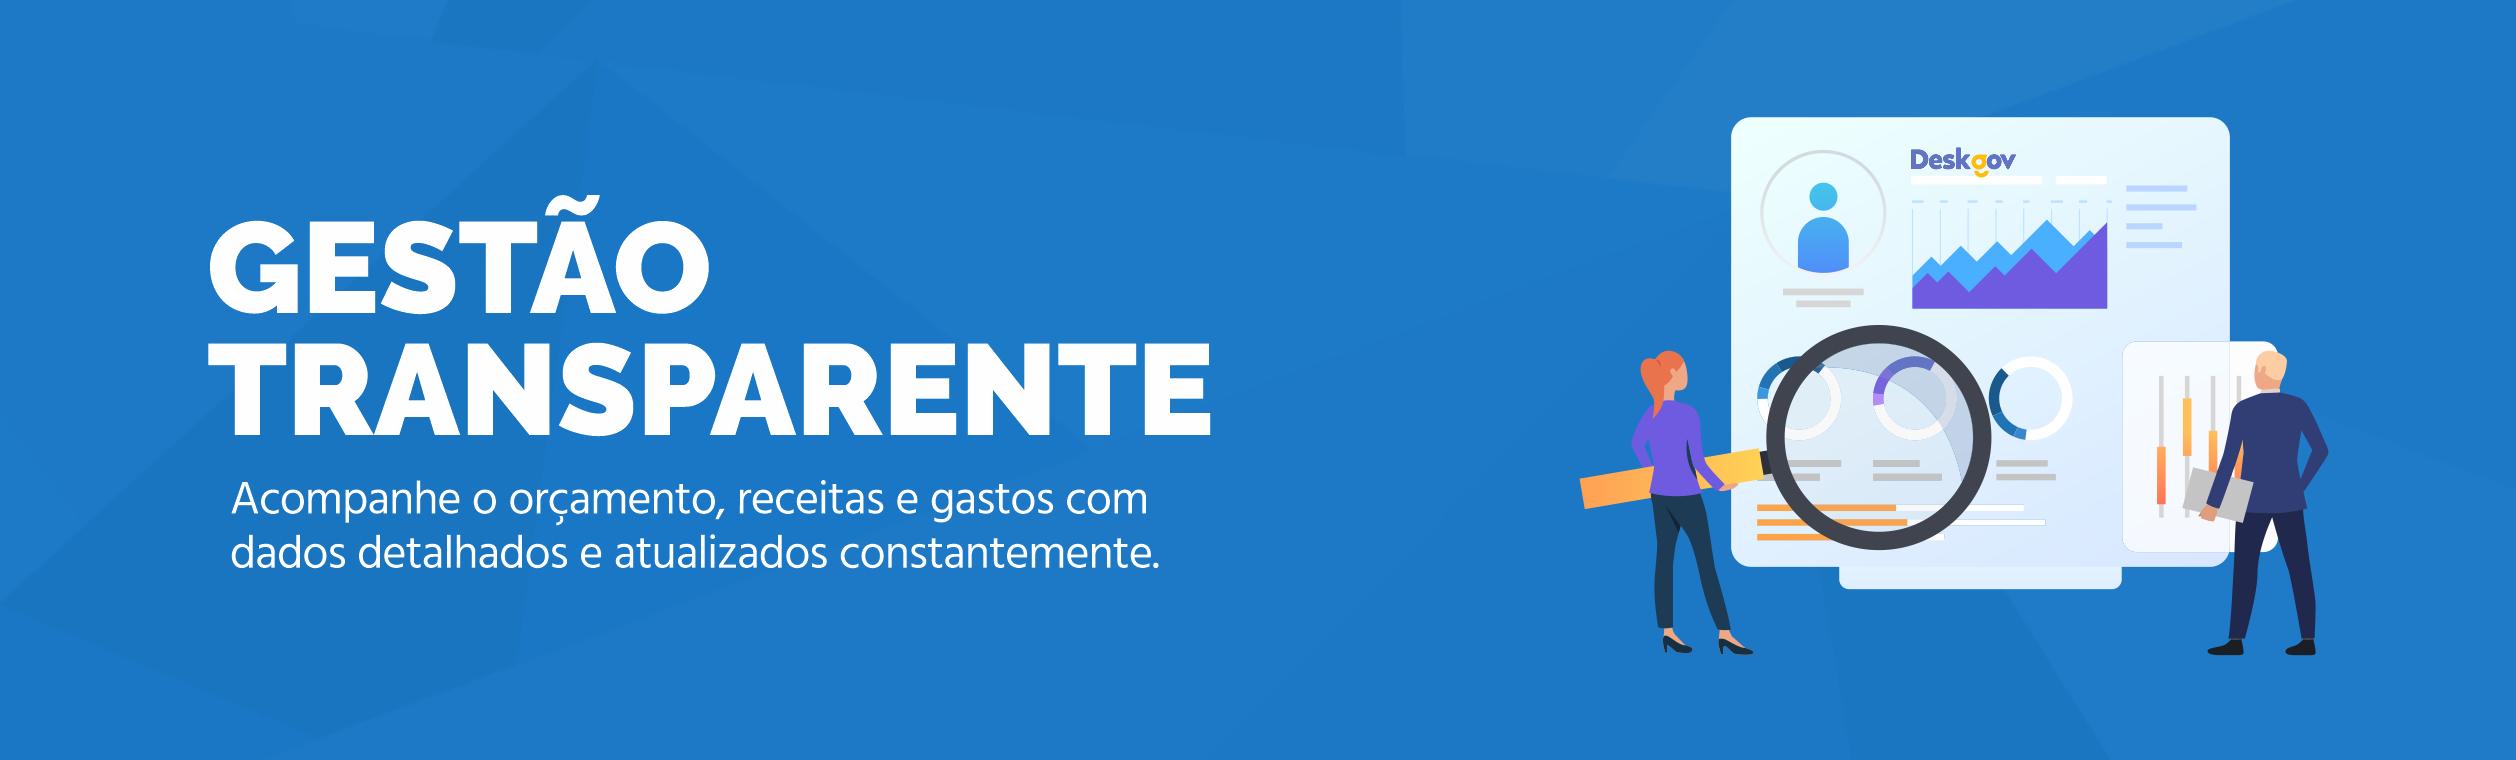 Gestao-Transparente-1-1.png